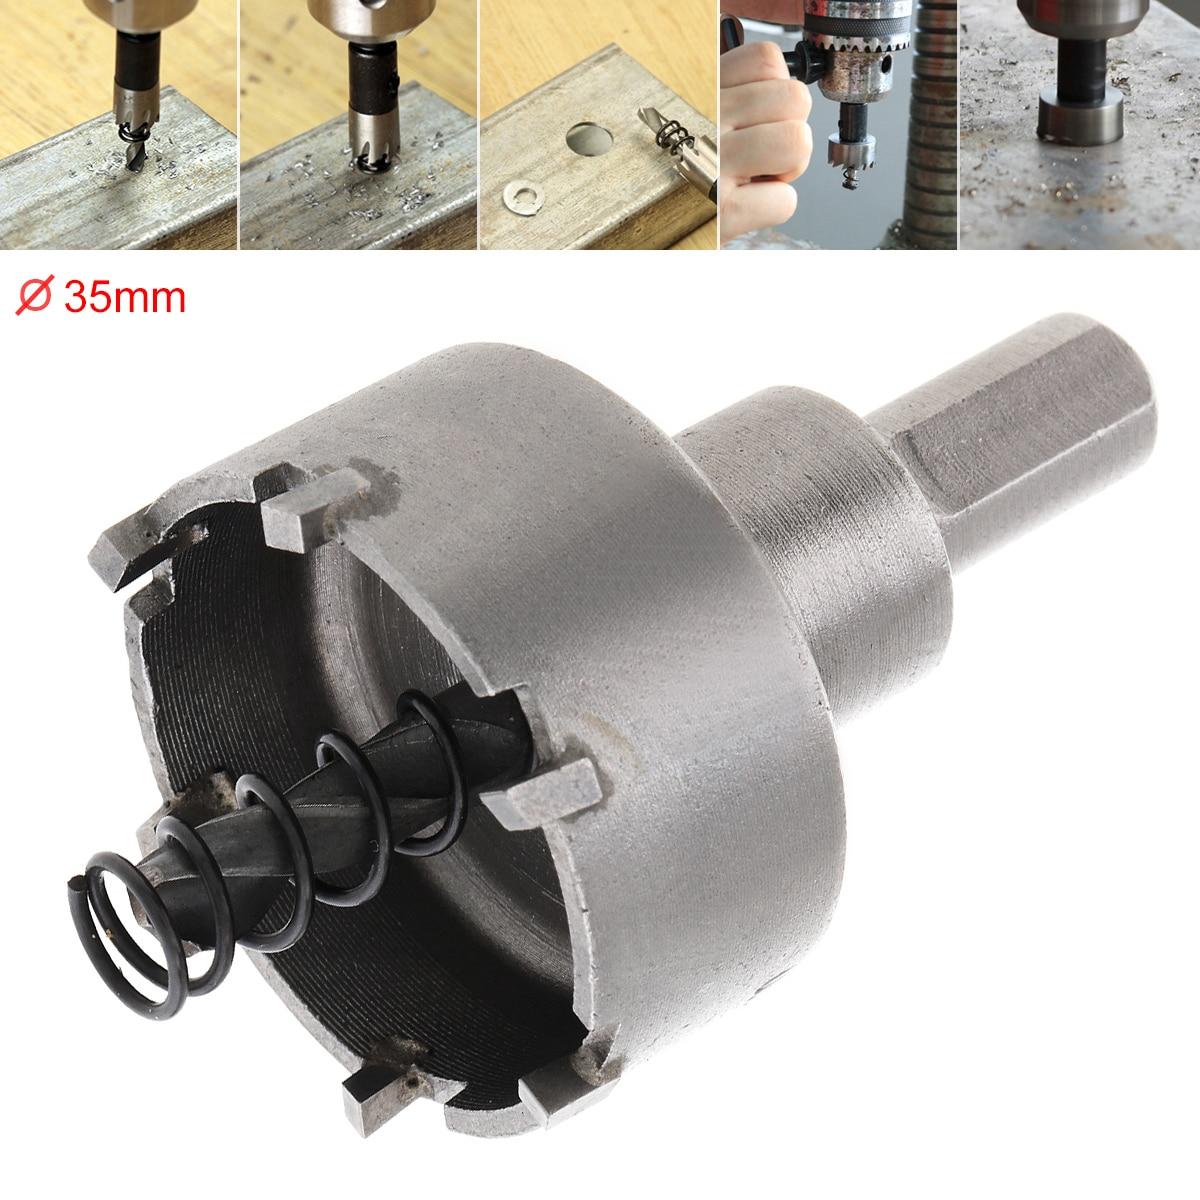 35MM/Carbide Cutter Head HSS Drill Set Hole For Stainless Steel Metal Alloy Cutter